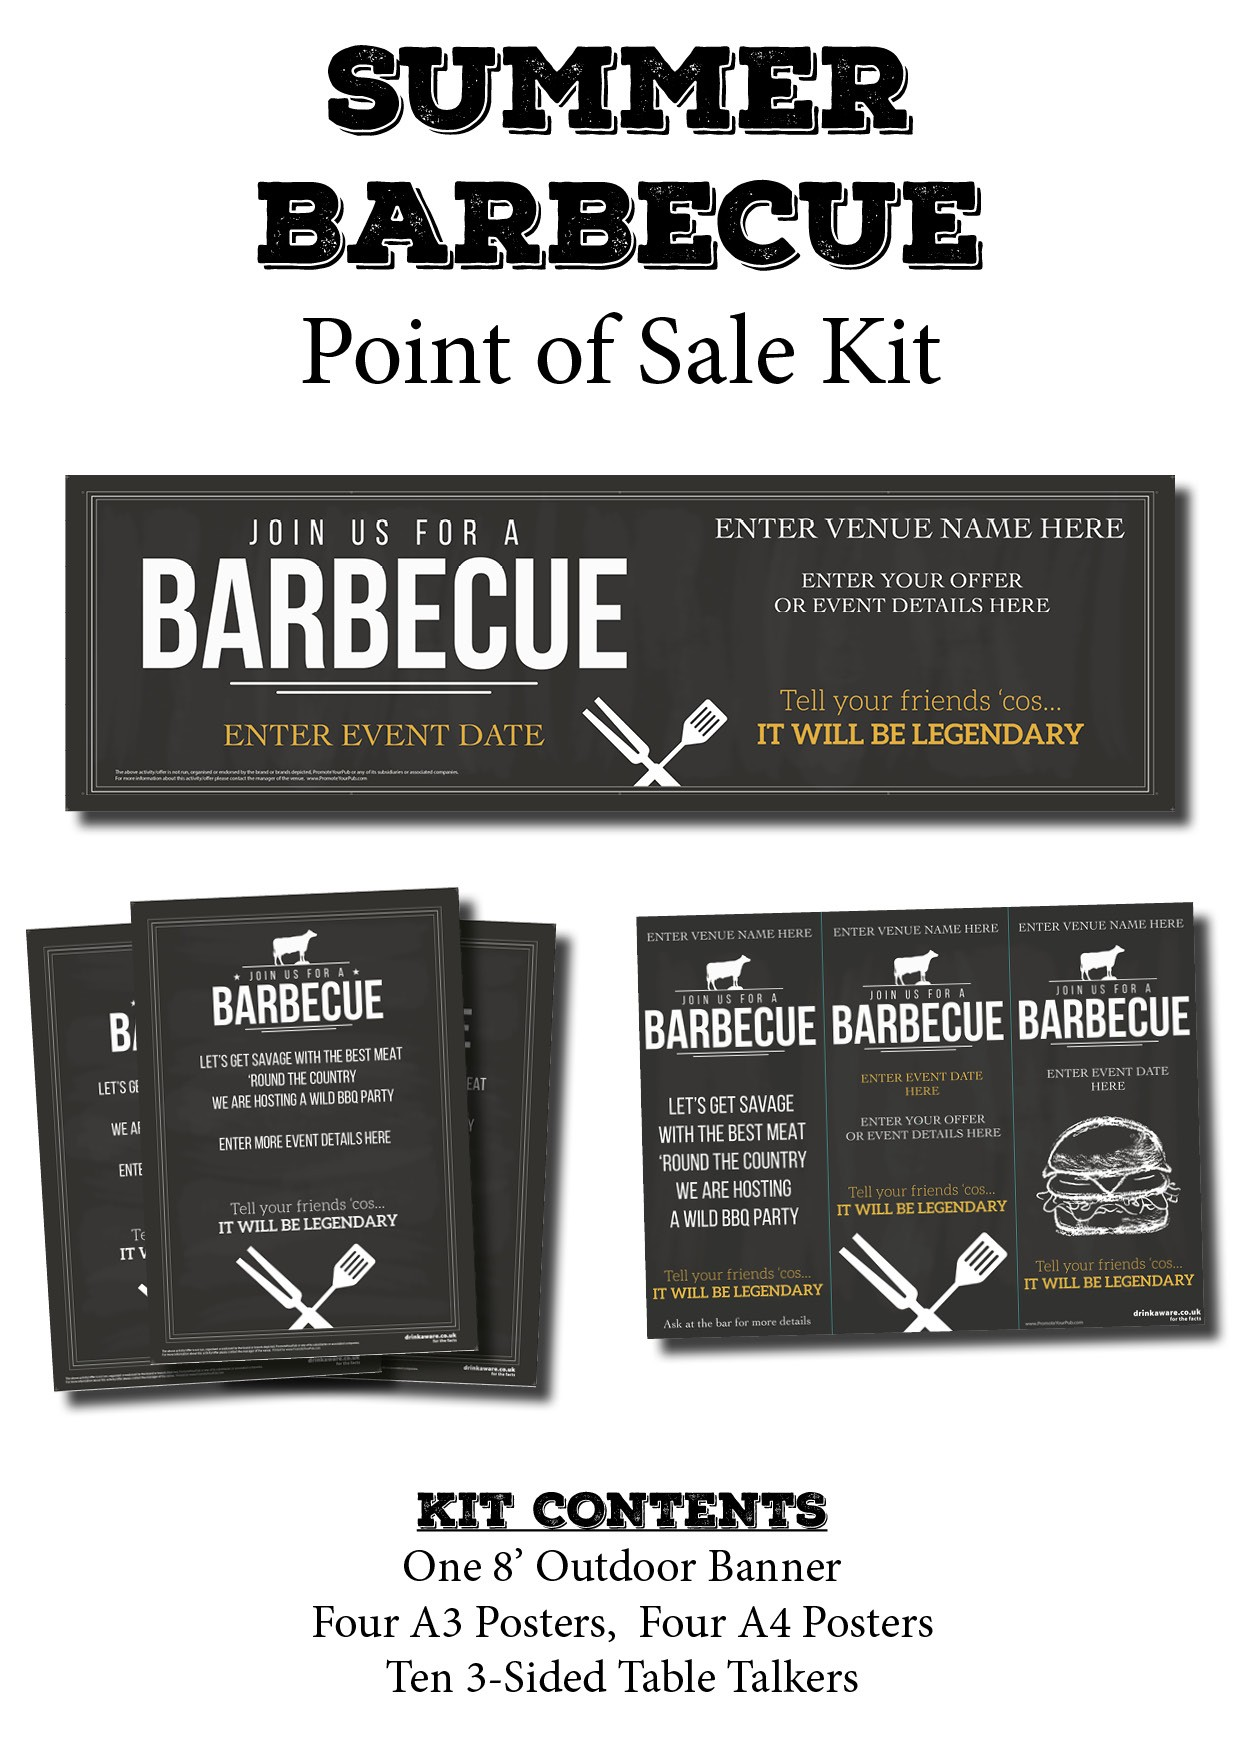 BBQ Point Of Sale KIT (chalk)